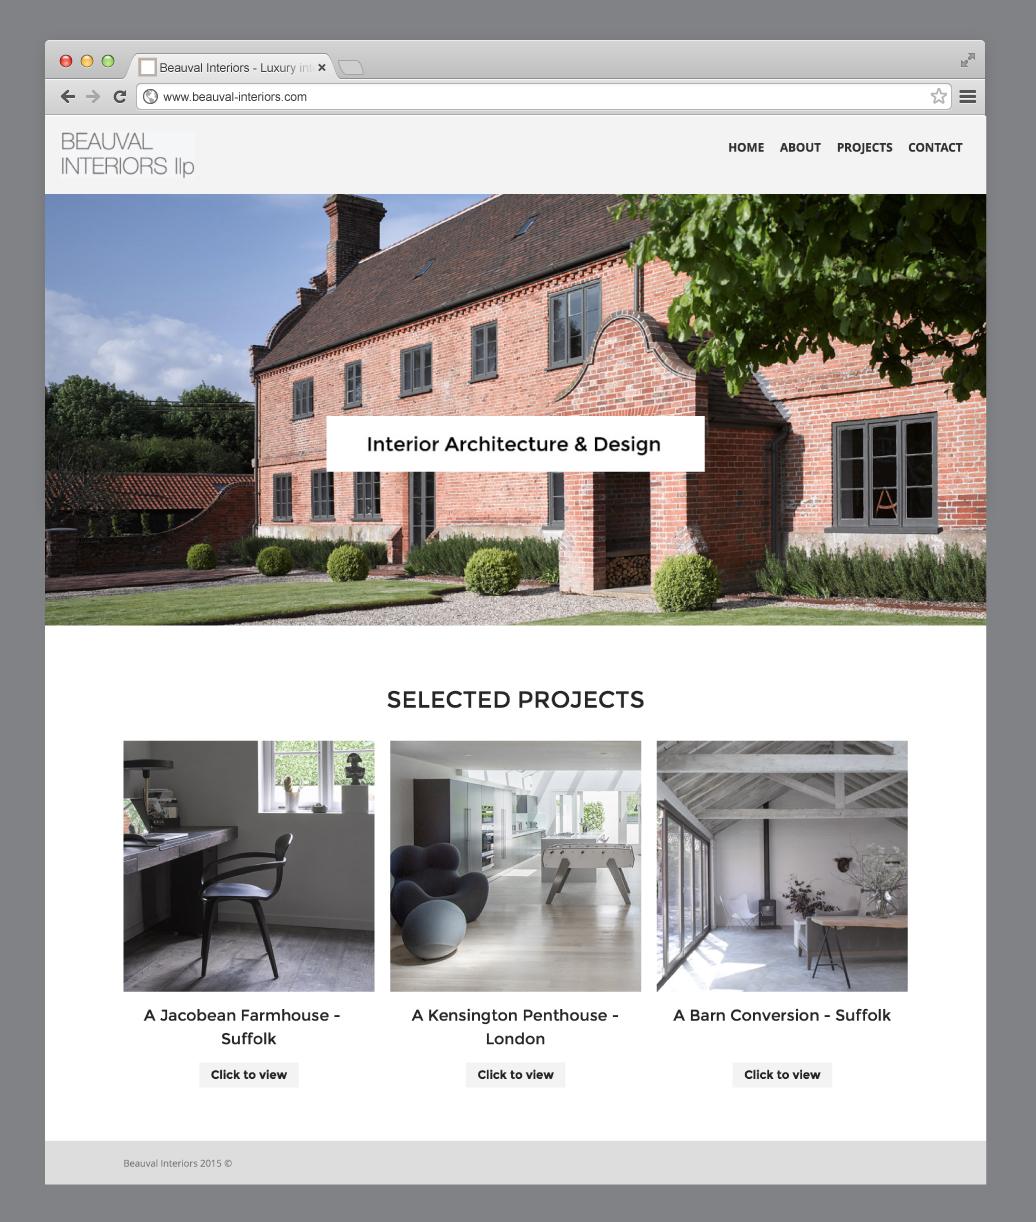 beauval-interiors-site